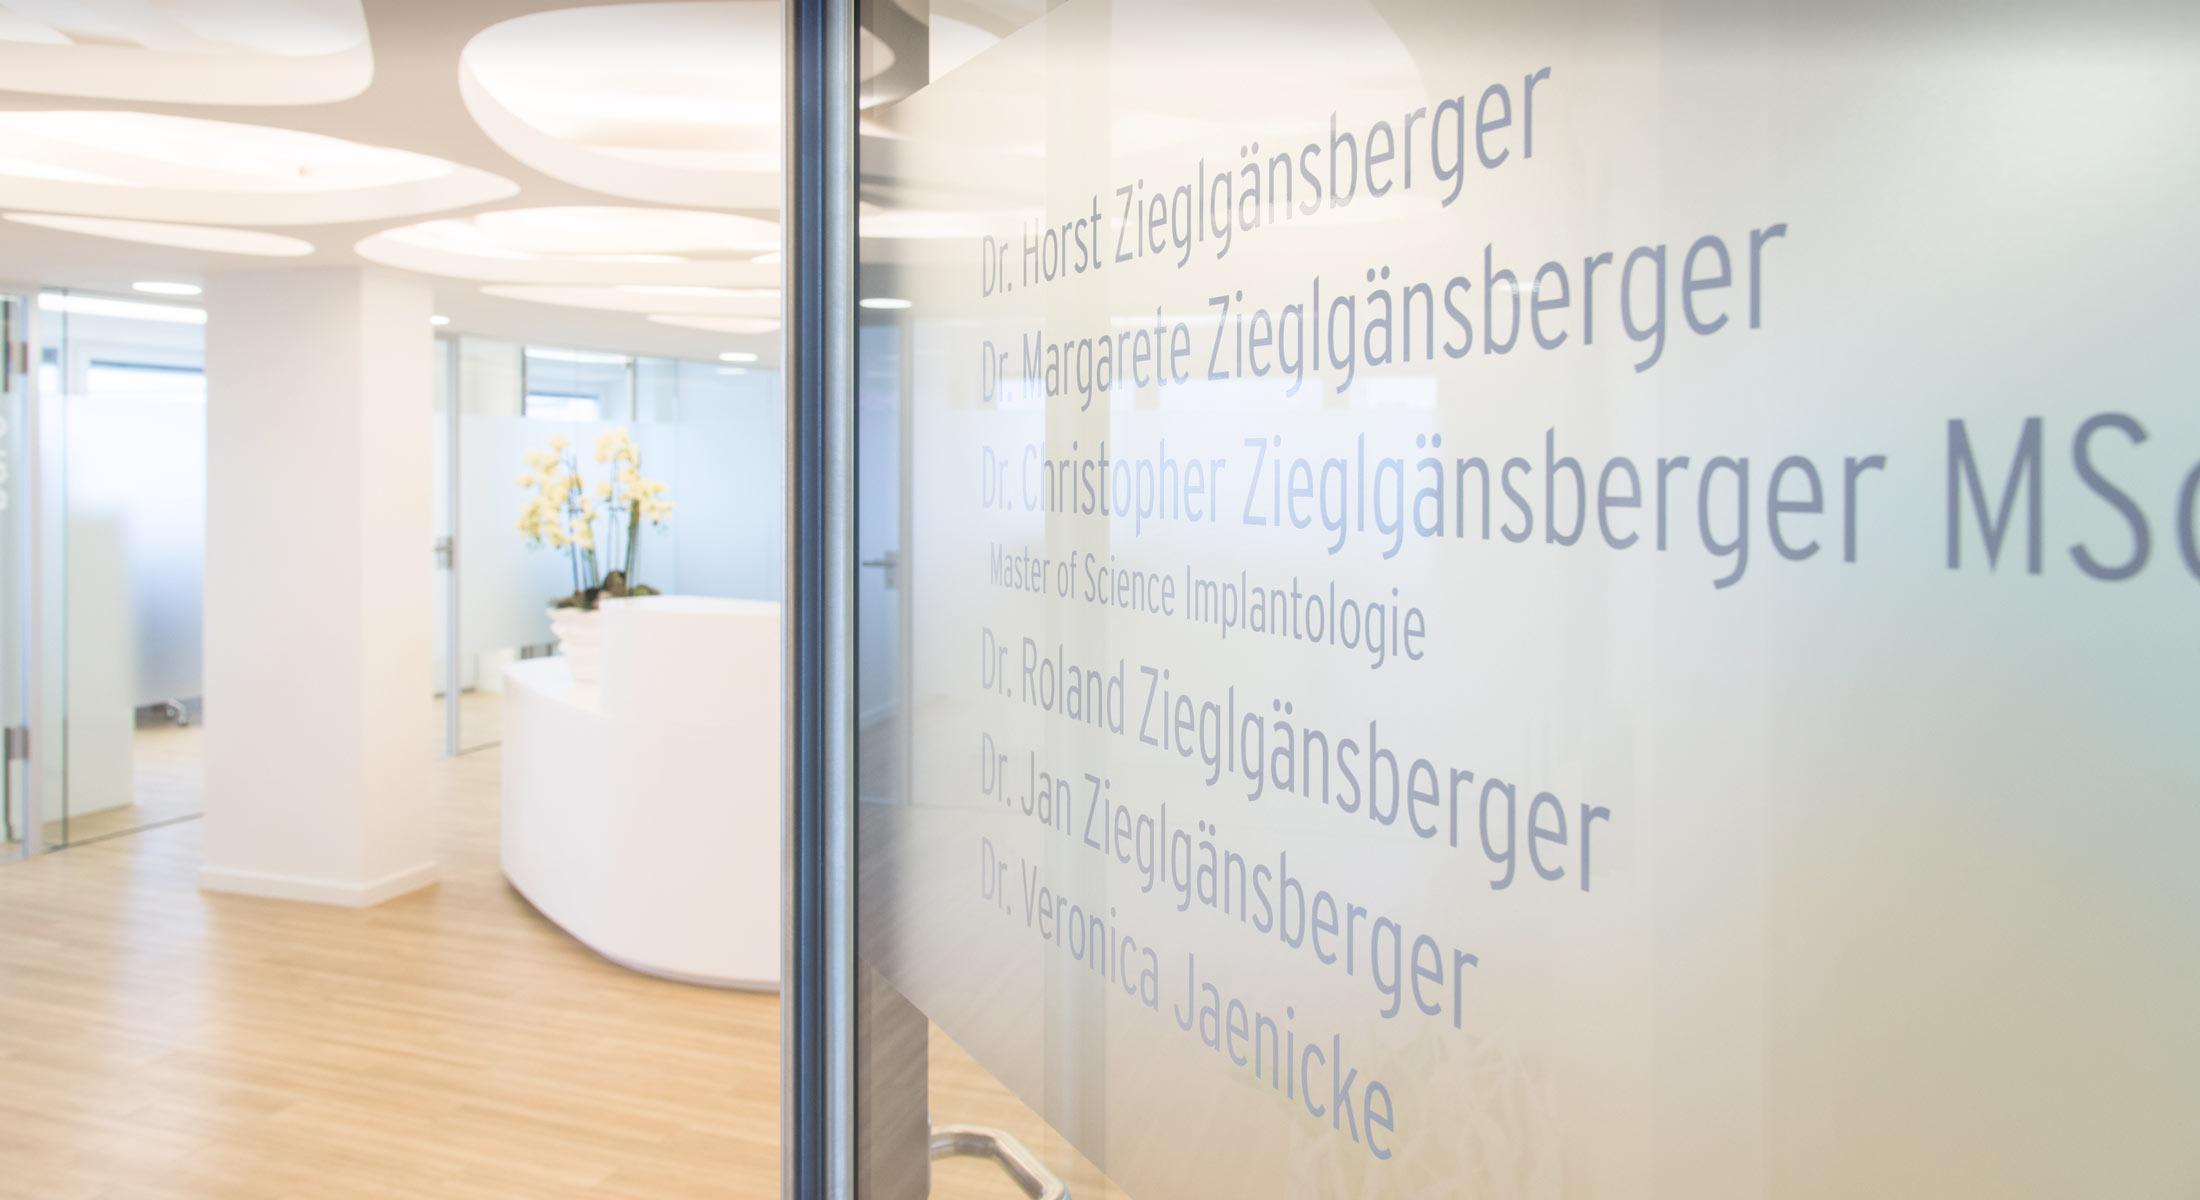 Empfangsbereich der Zahnarztpraxis Zieglgänsberger in Dietzenbach/Kreis Offenbach/Hessen bei Frankfurt